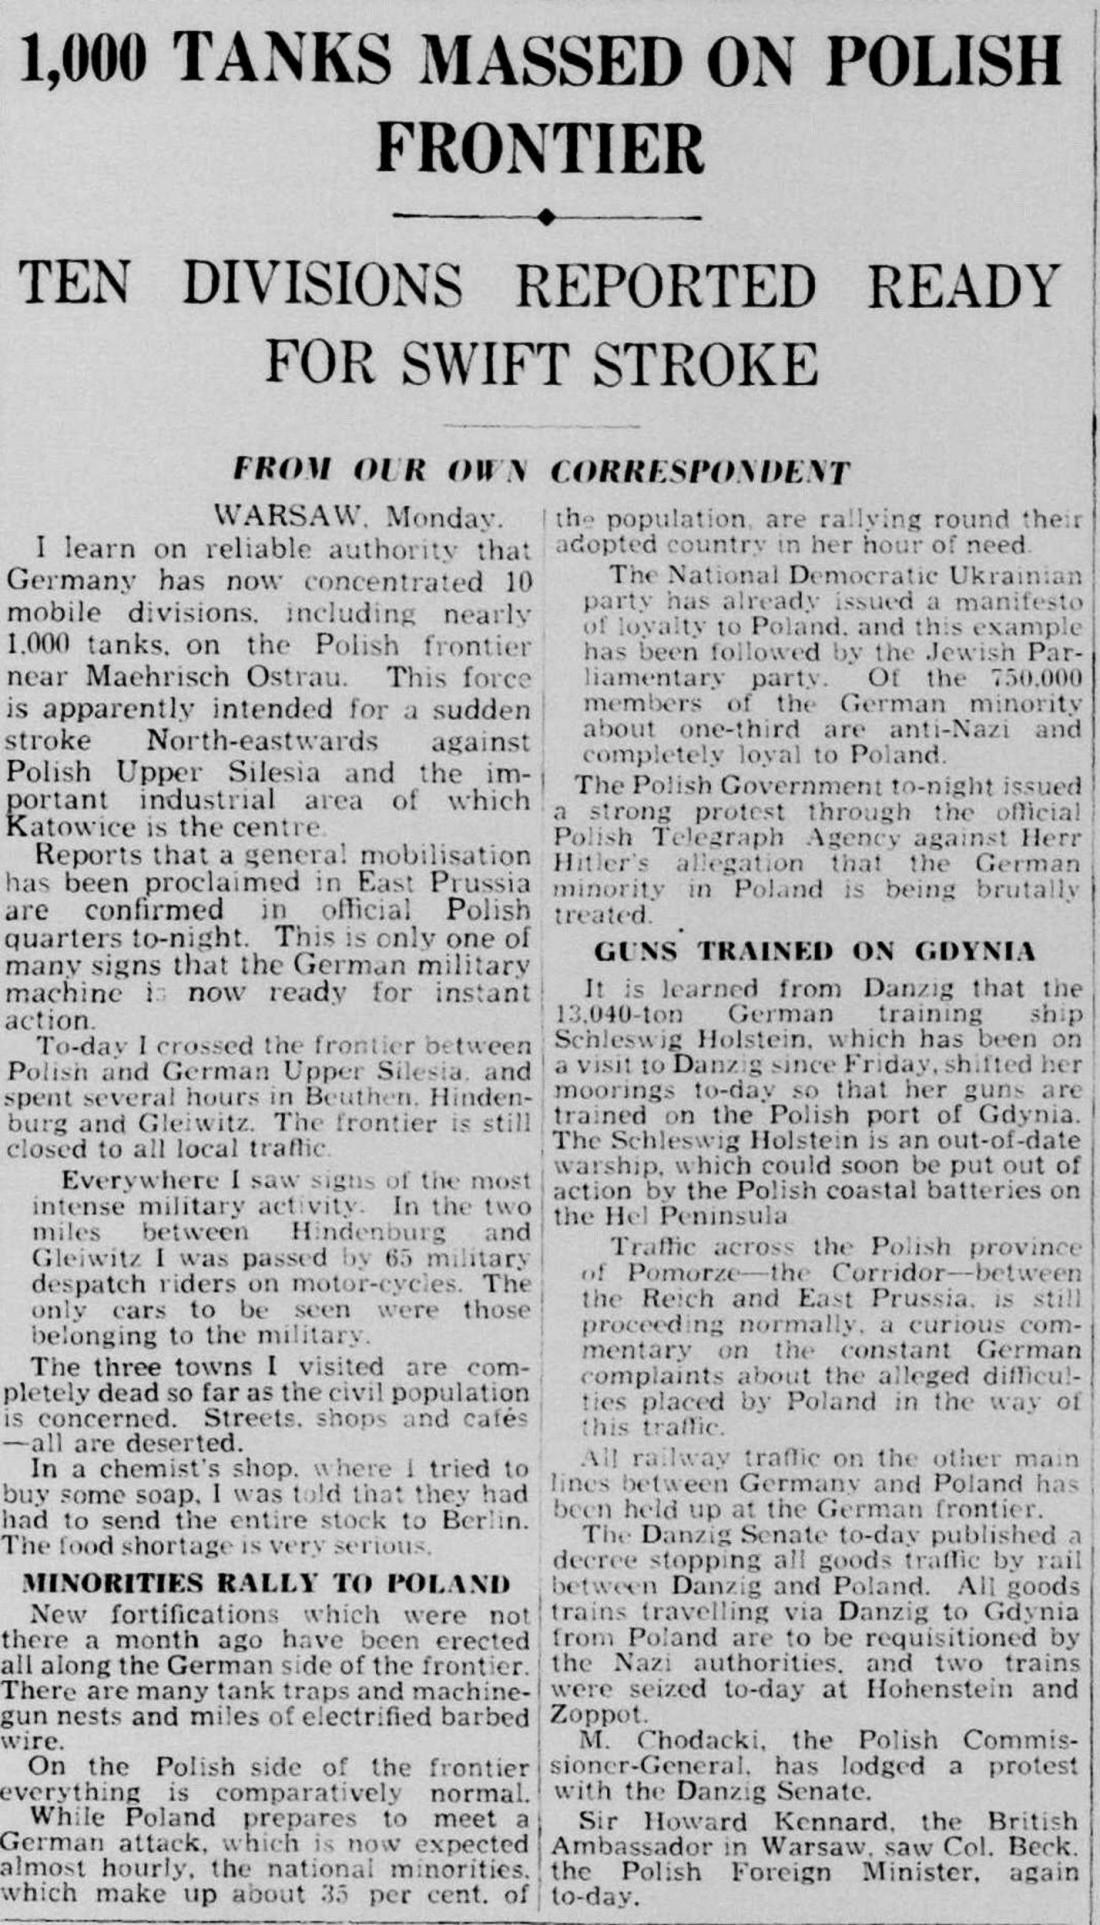 29 августа, 1939 год: публикация в газете